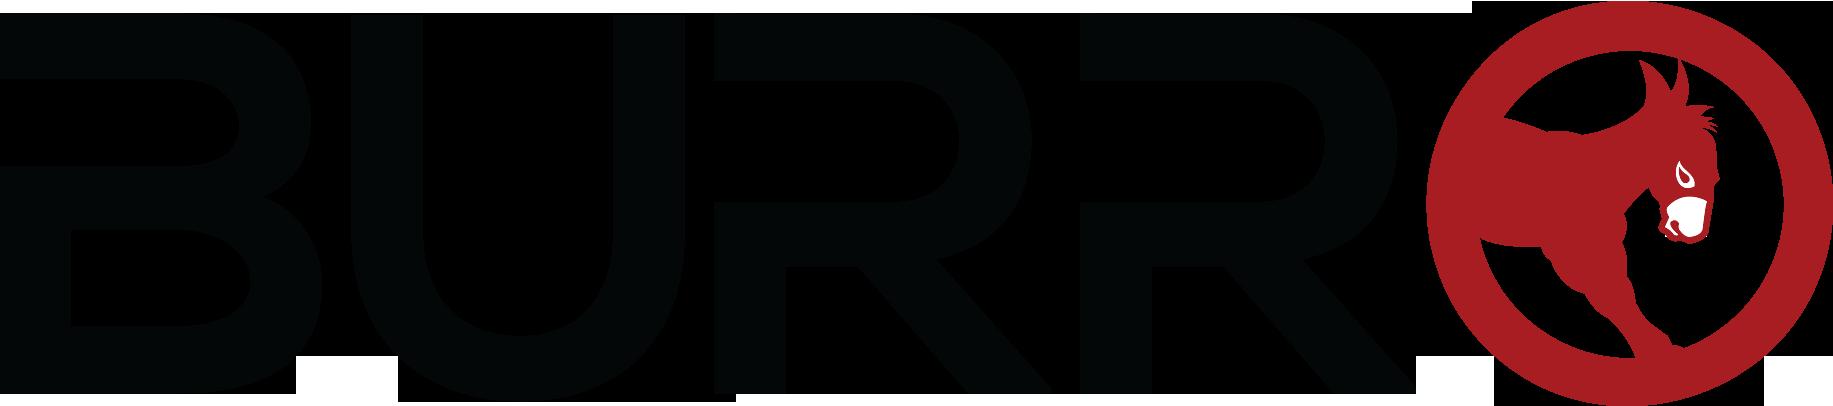 Burro logo